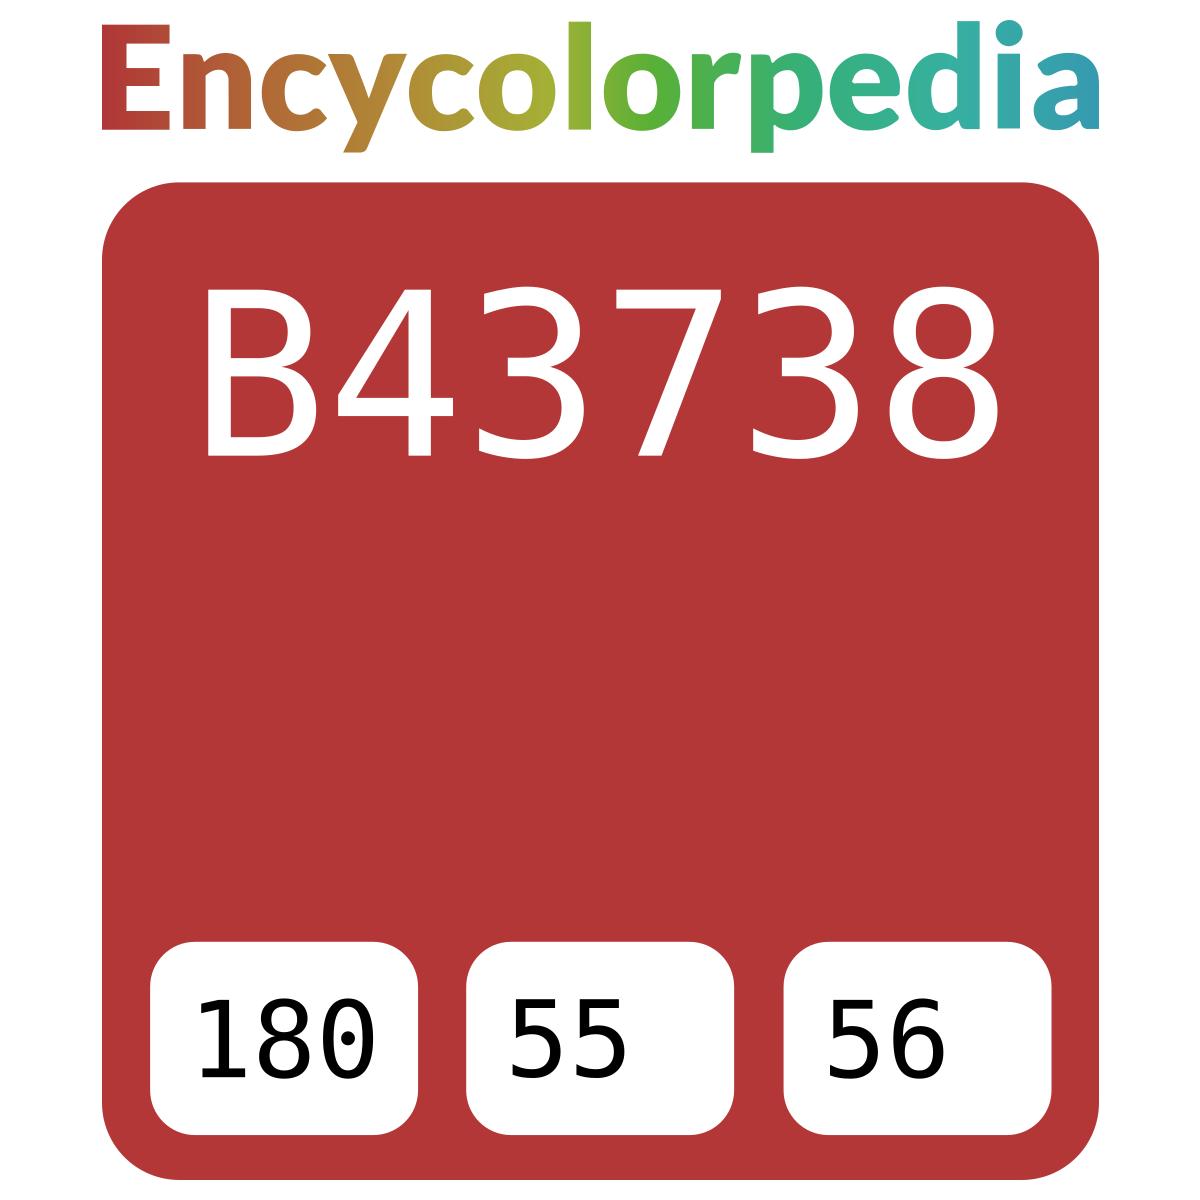 b43738